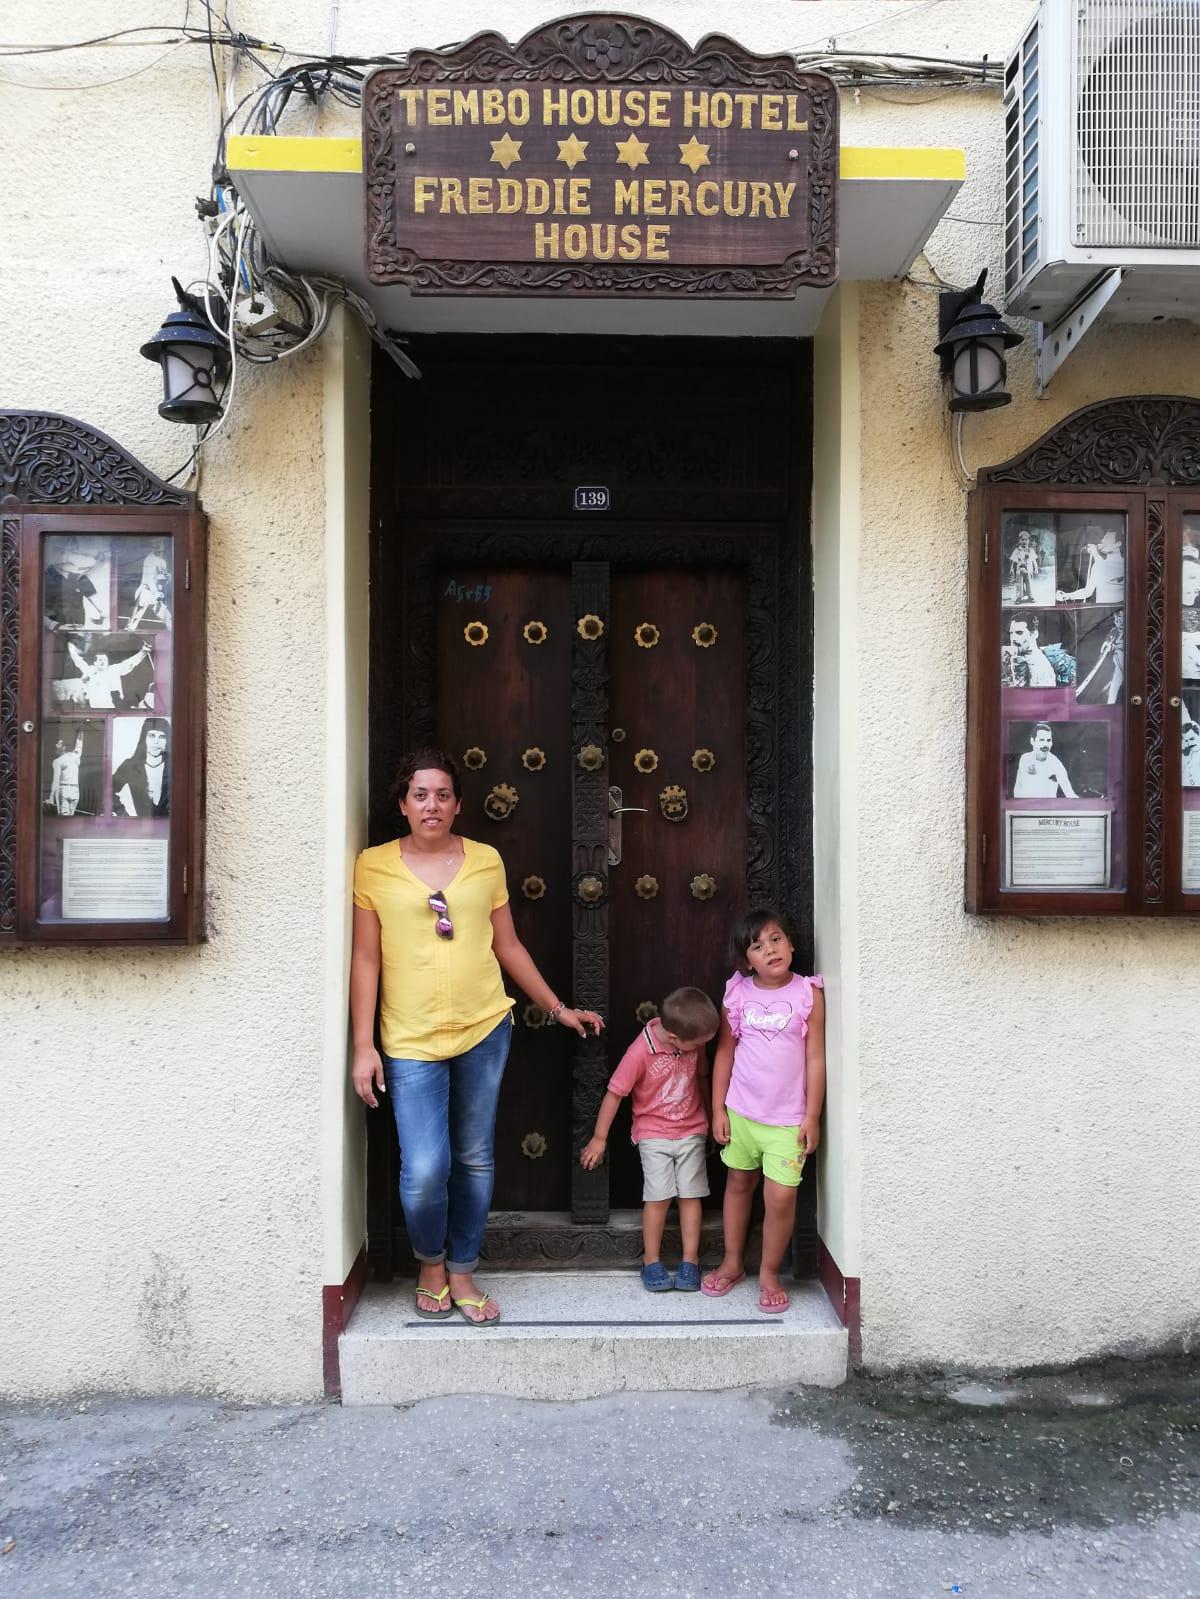 10 cose da fare a Zanzibar - Tour di Stone Town, casa di Freddie Mercury